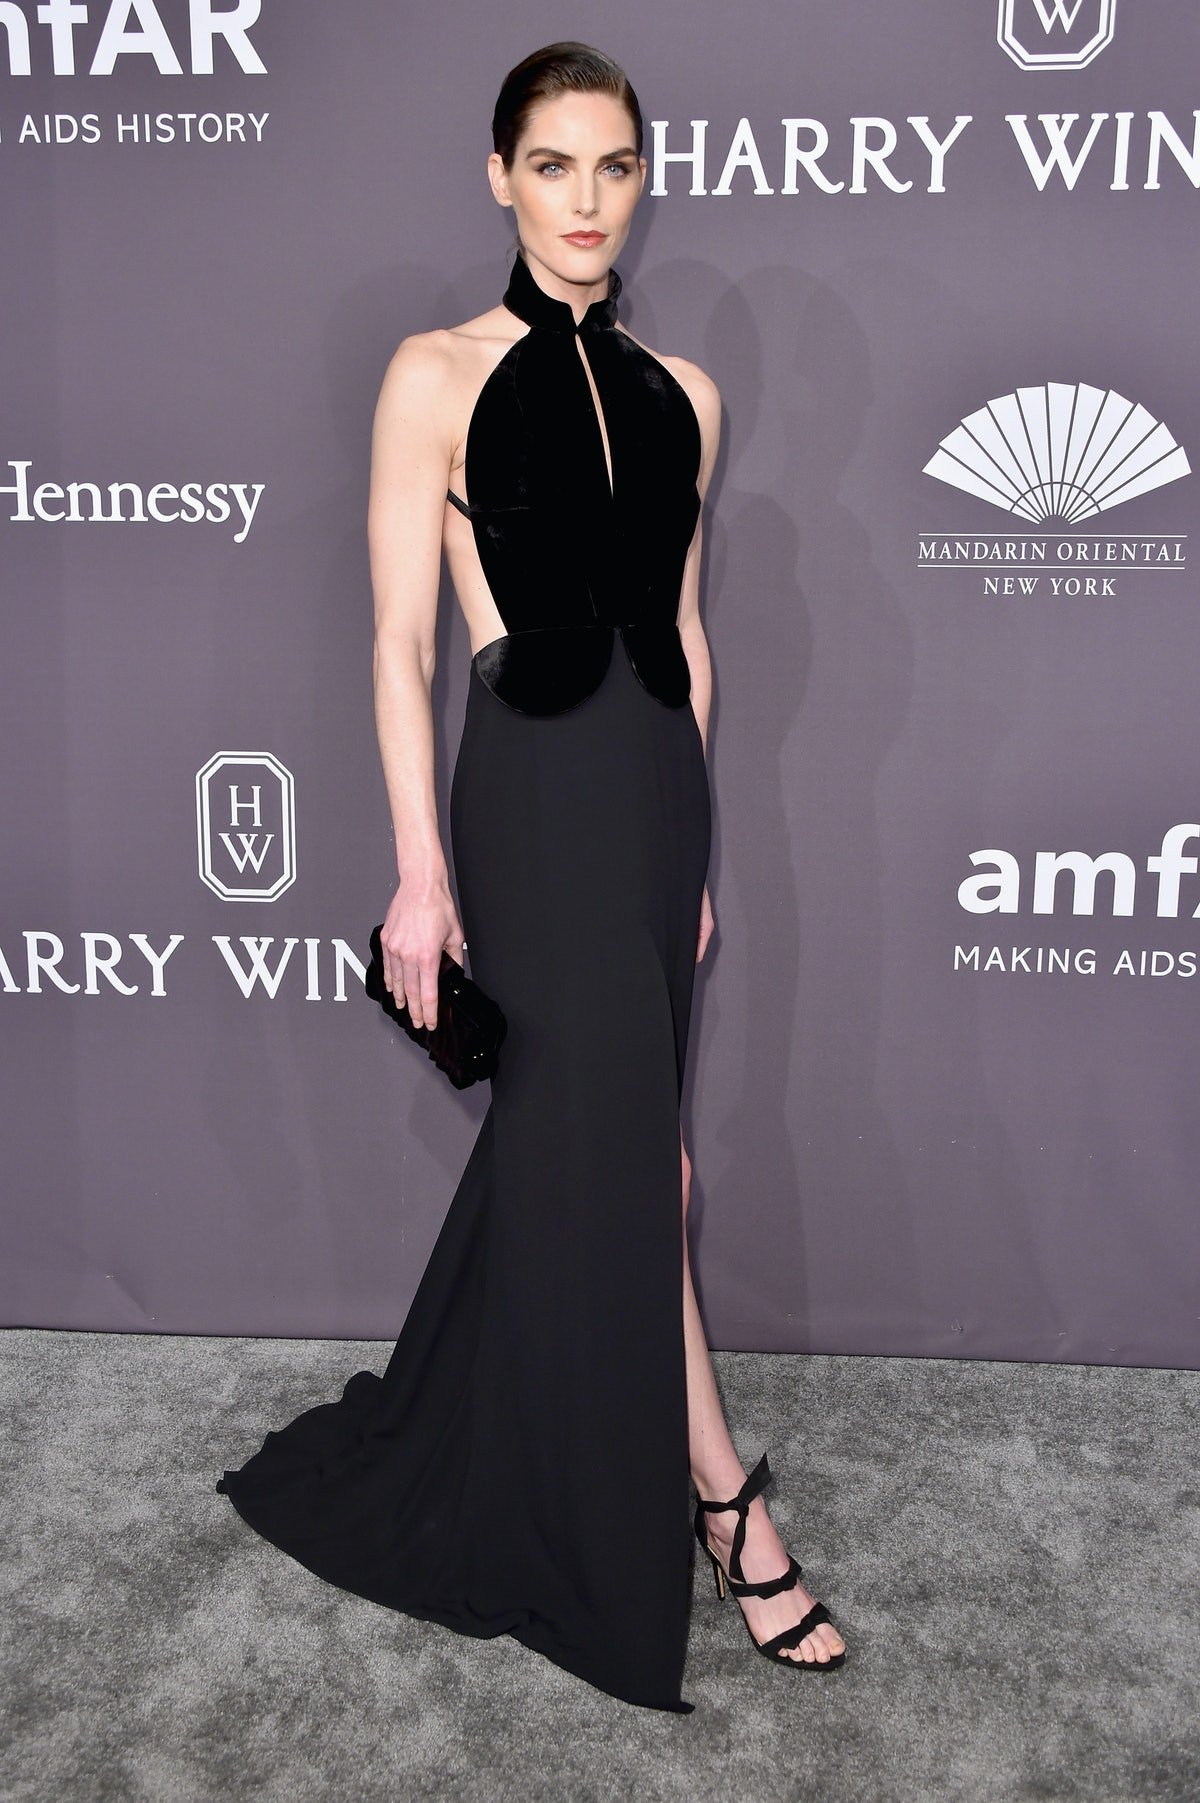 19th Annual amfAR New York Gala - Arrivals